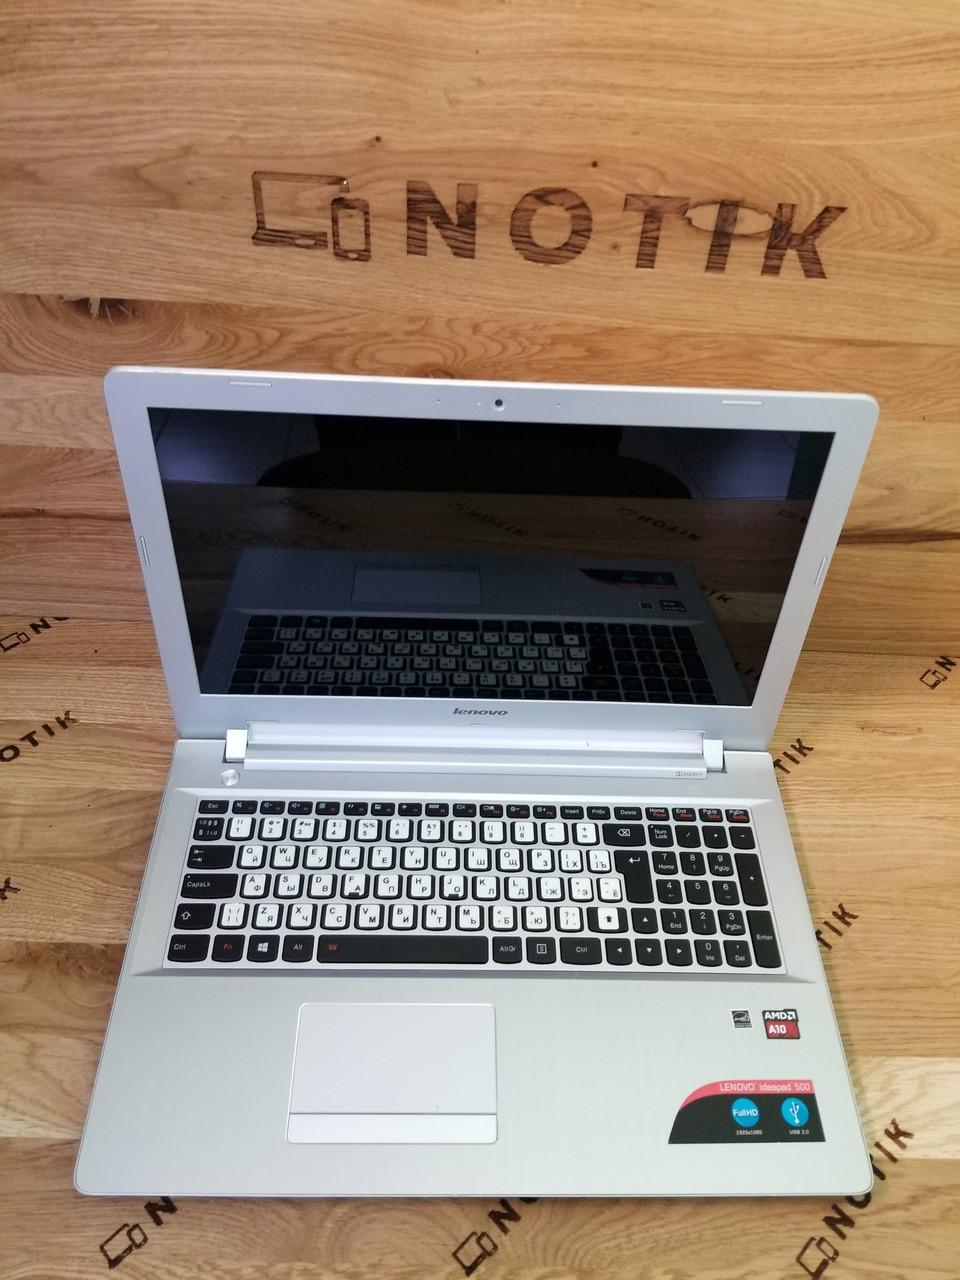 Lenovo IdeaPad 500-15ACZ AMD A10-8700p 3.2GHz/8Gb/120 Gb SSD/AMD Radeon R6/ HD 1366*768/підсвітка клавіатури